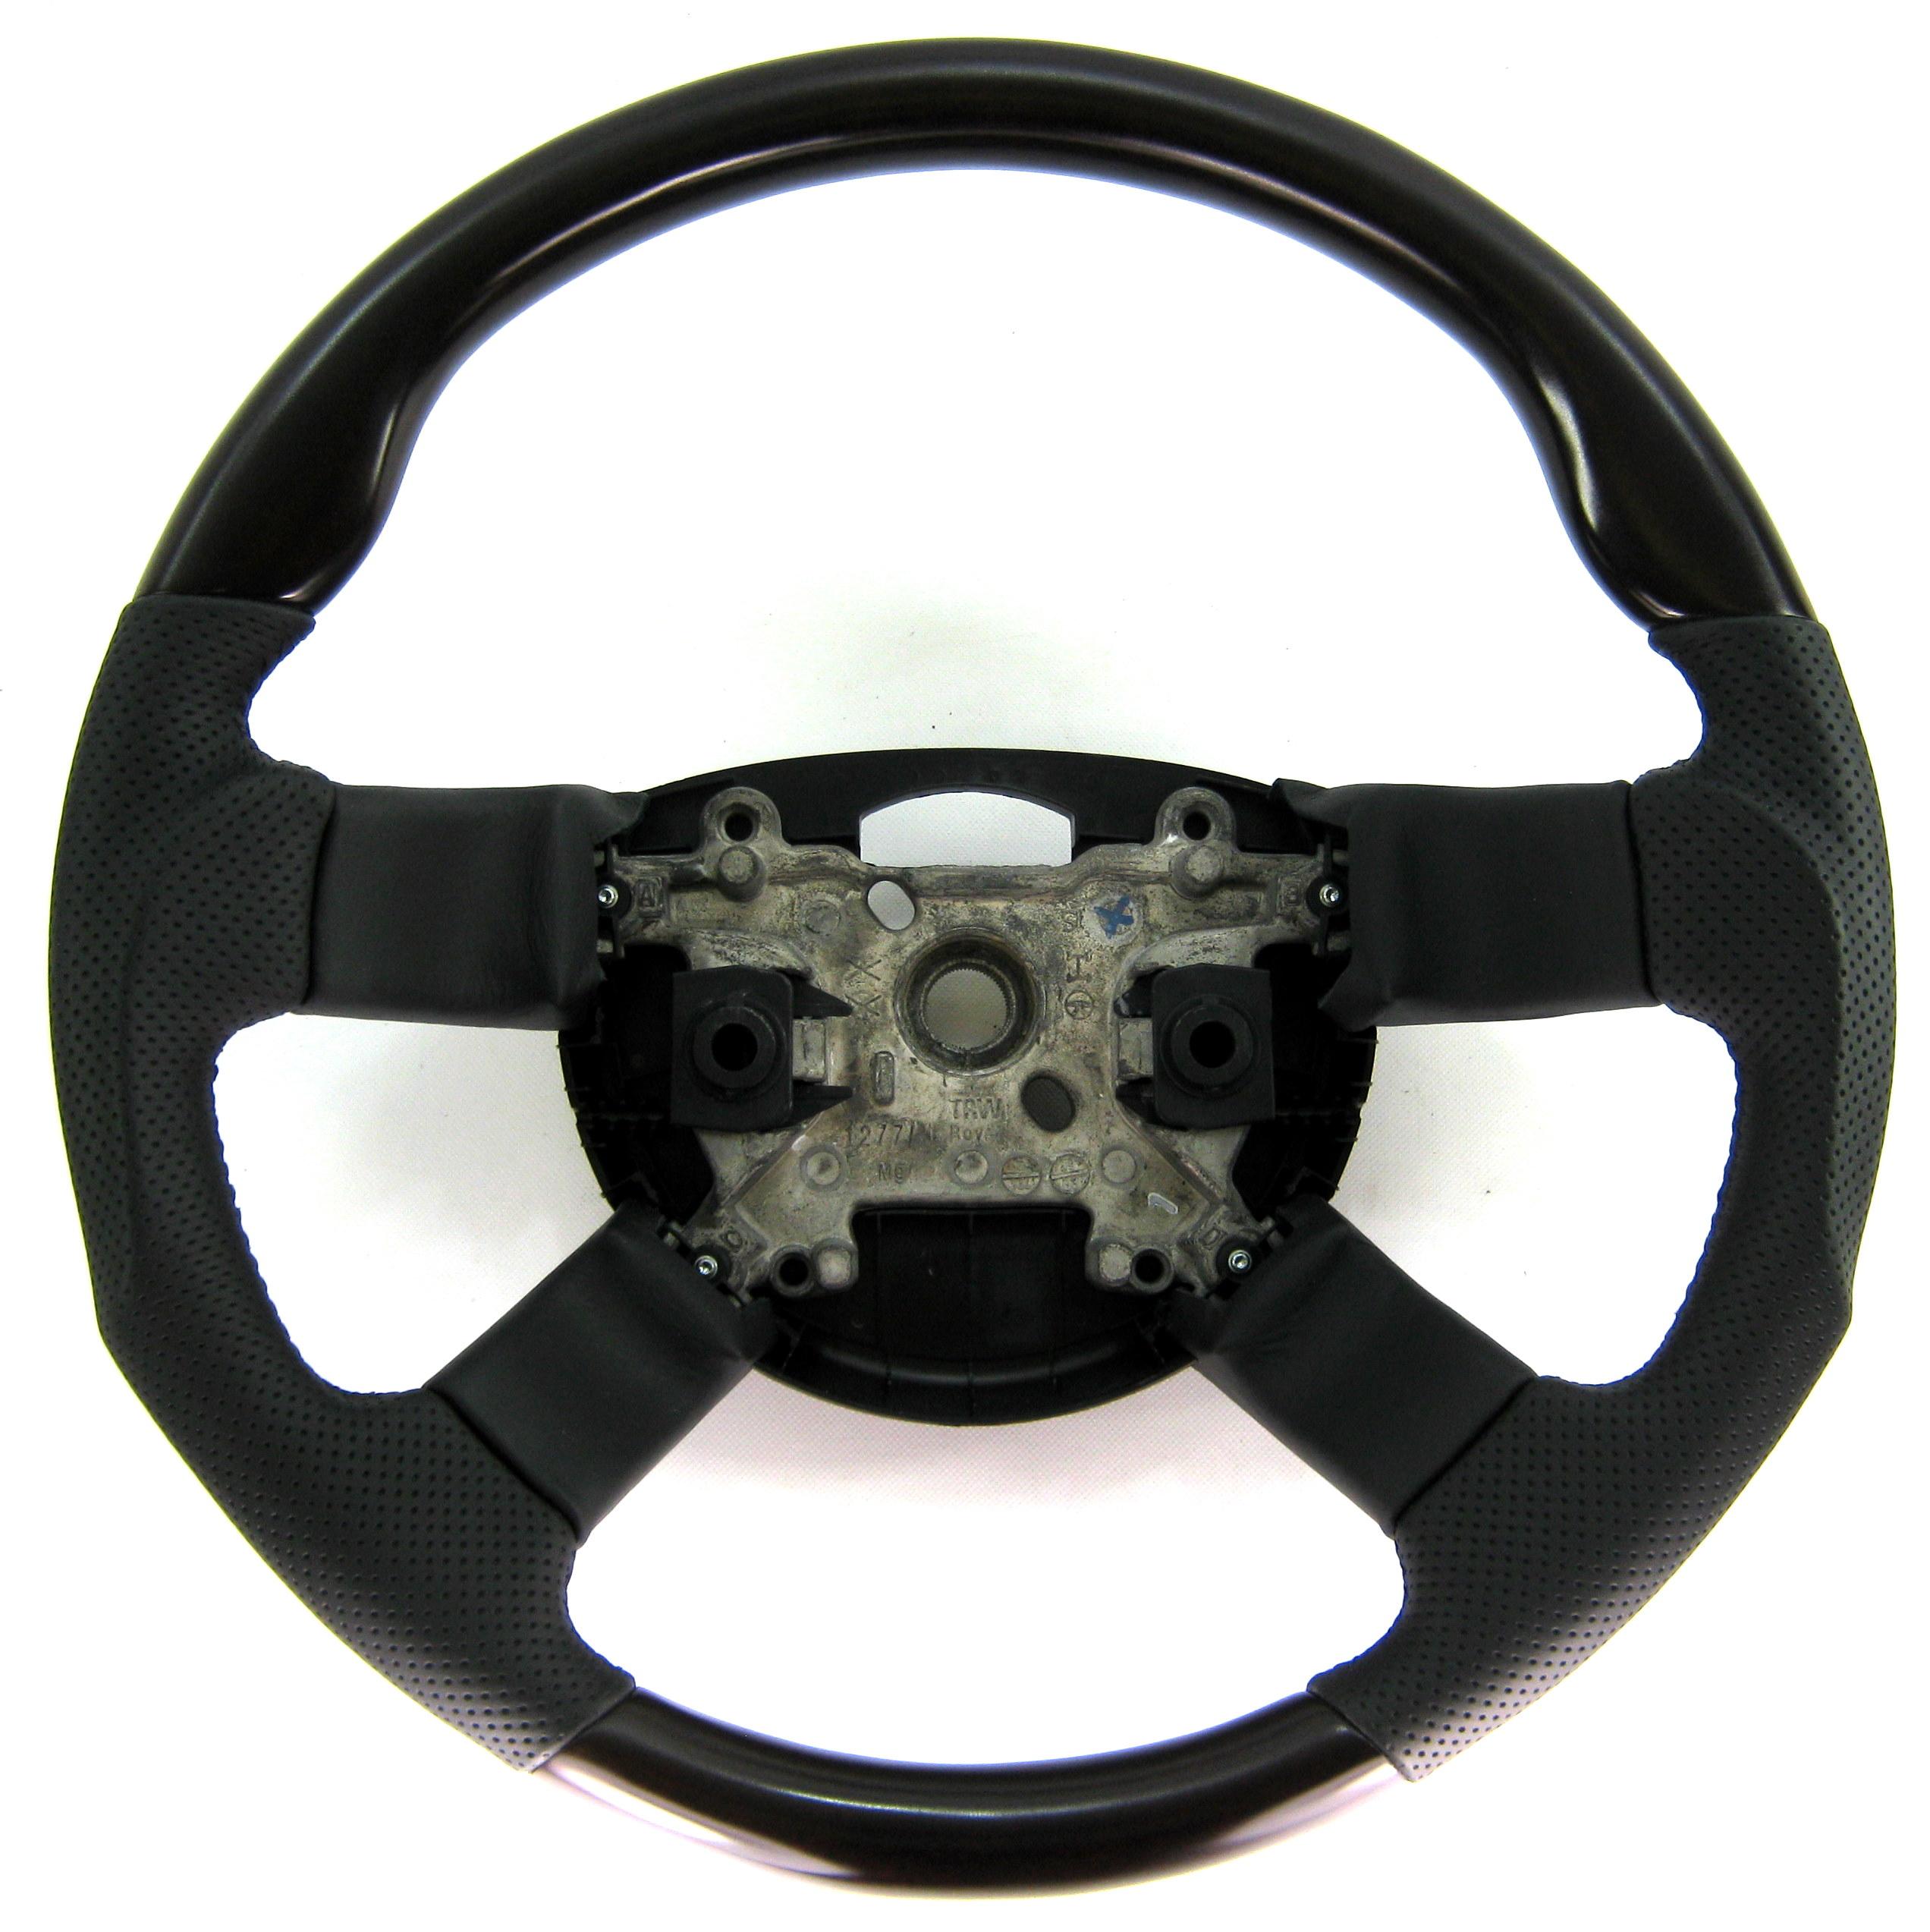 Heated Front Seats And Steering Wheel: Walnut Wood+Leather Sport Steering Wheel Range Rover L322